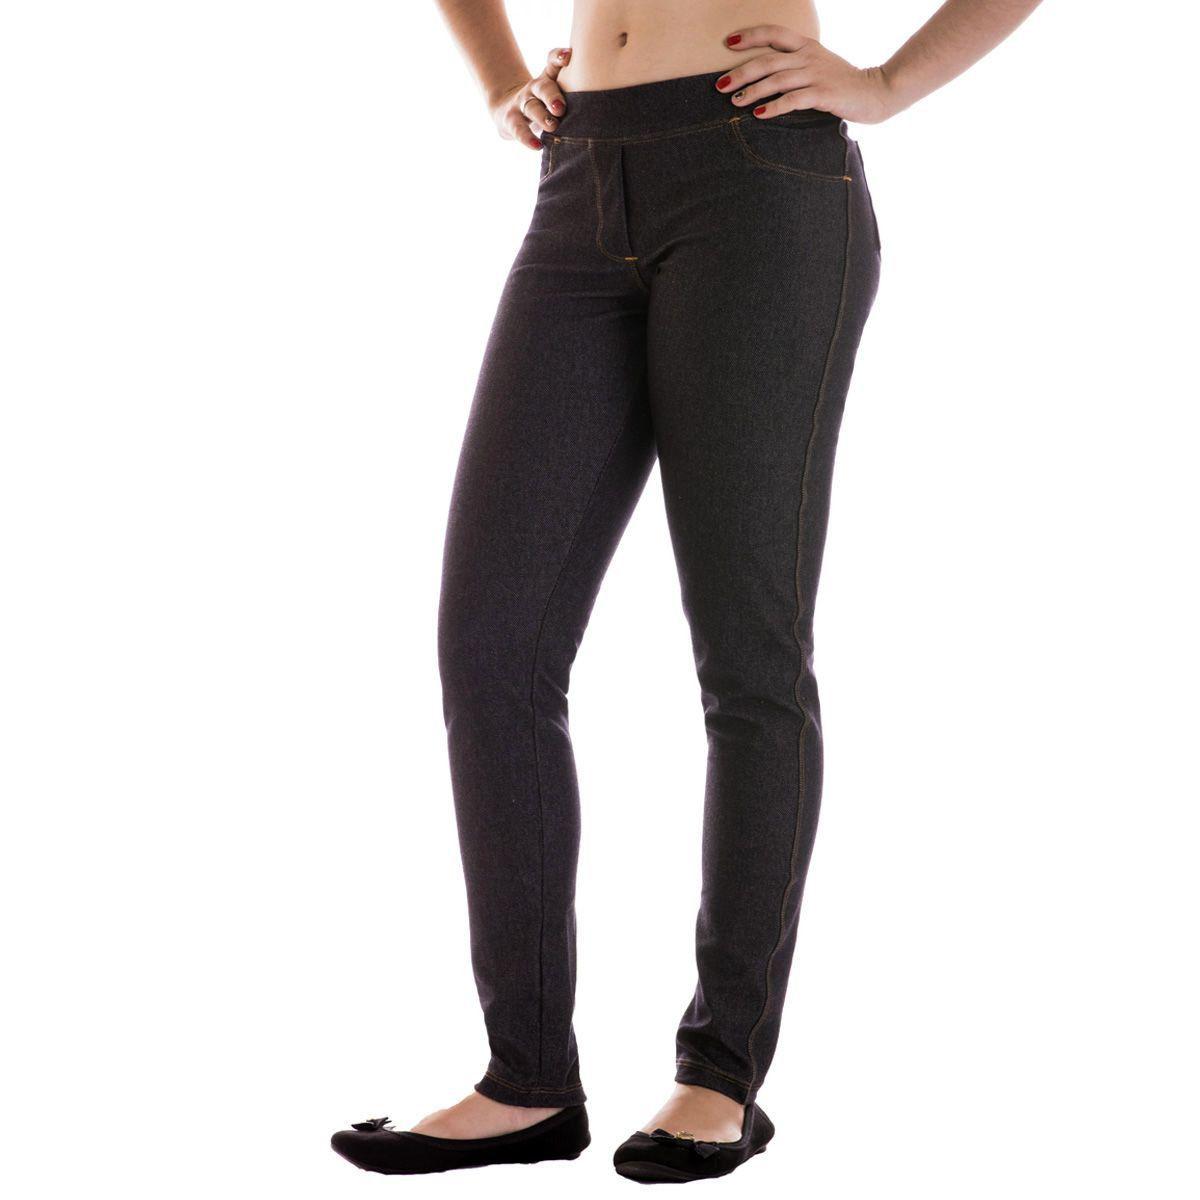 Legging Jeans Lupo Loba - Calça Leg que Imita Jeans